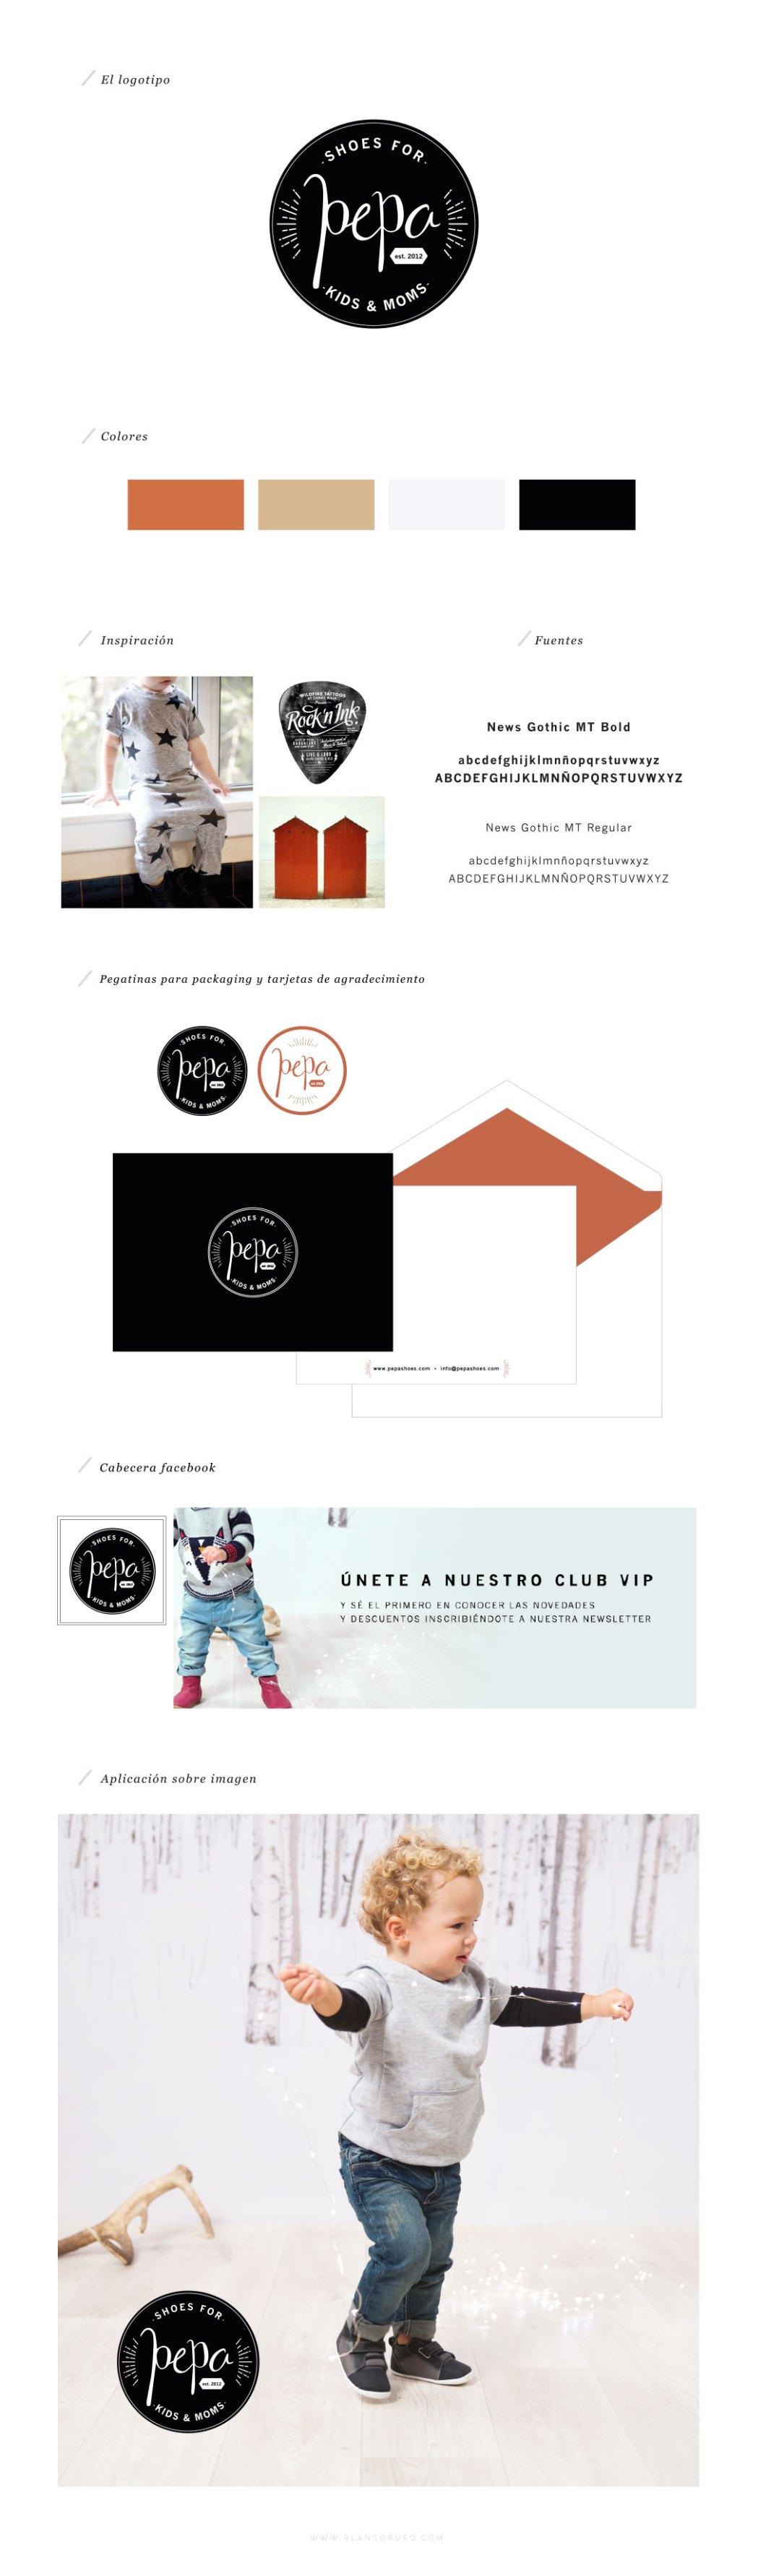 rebranding de una marca presentacion